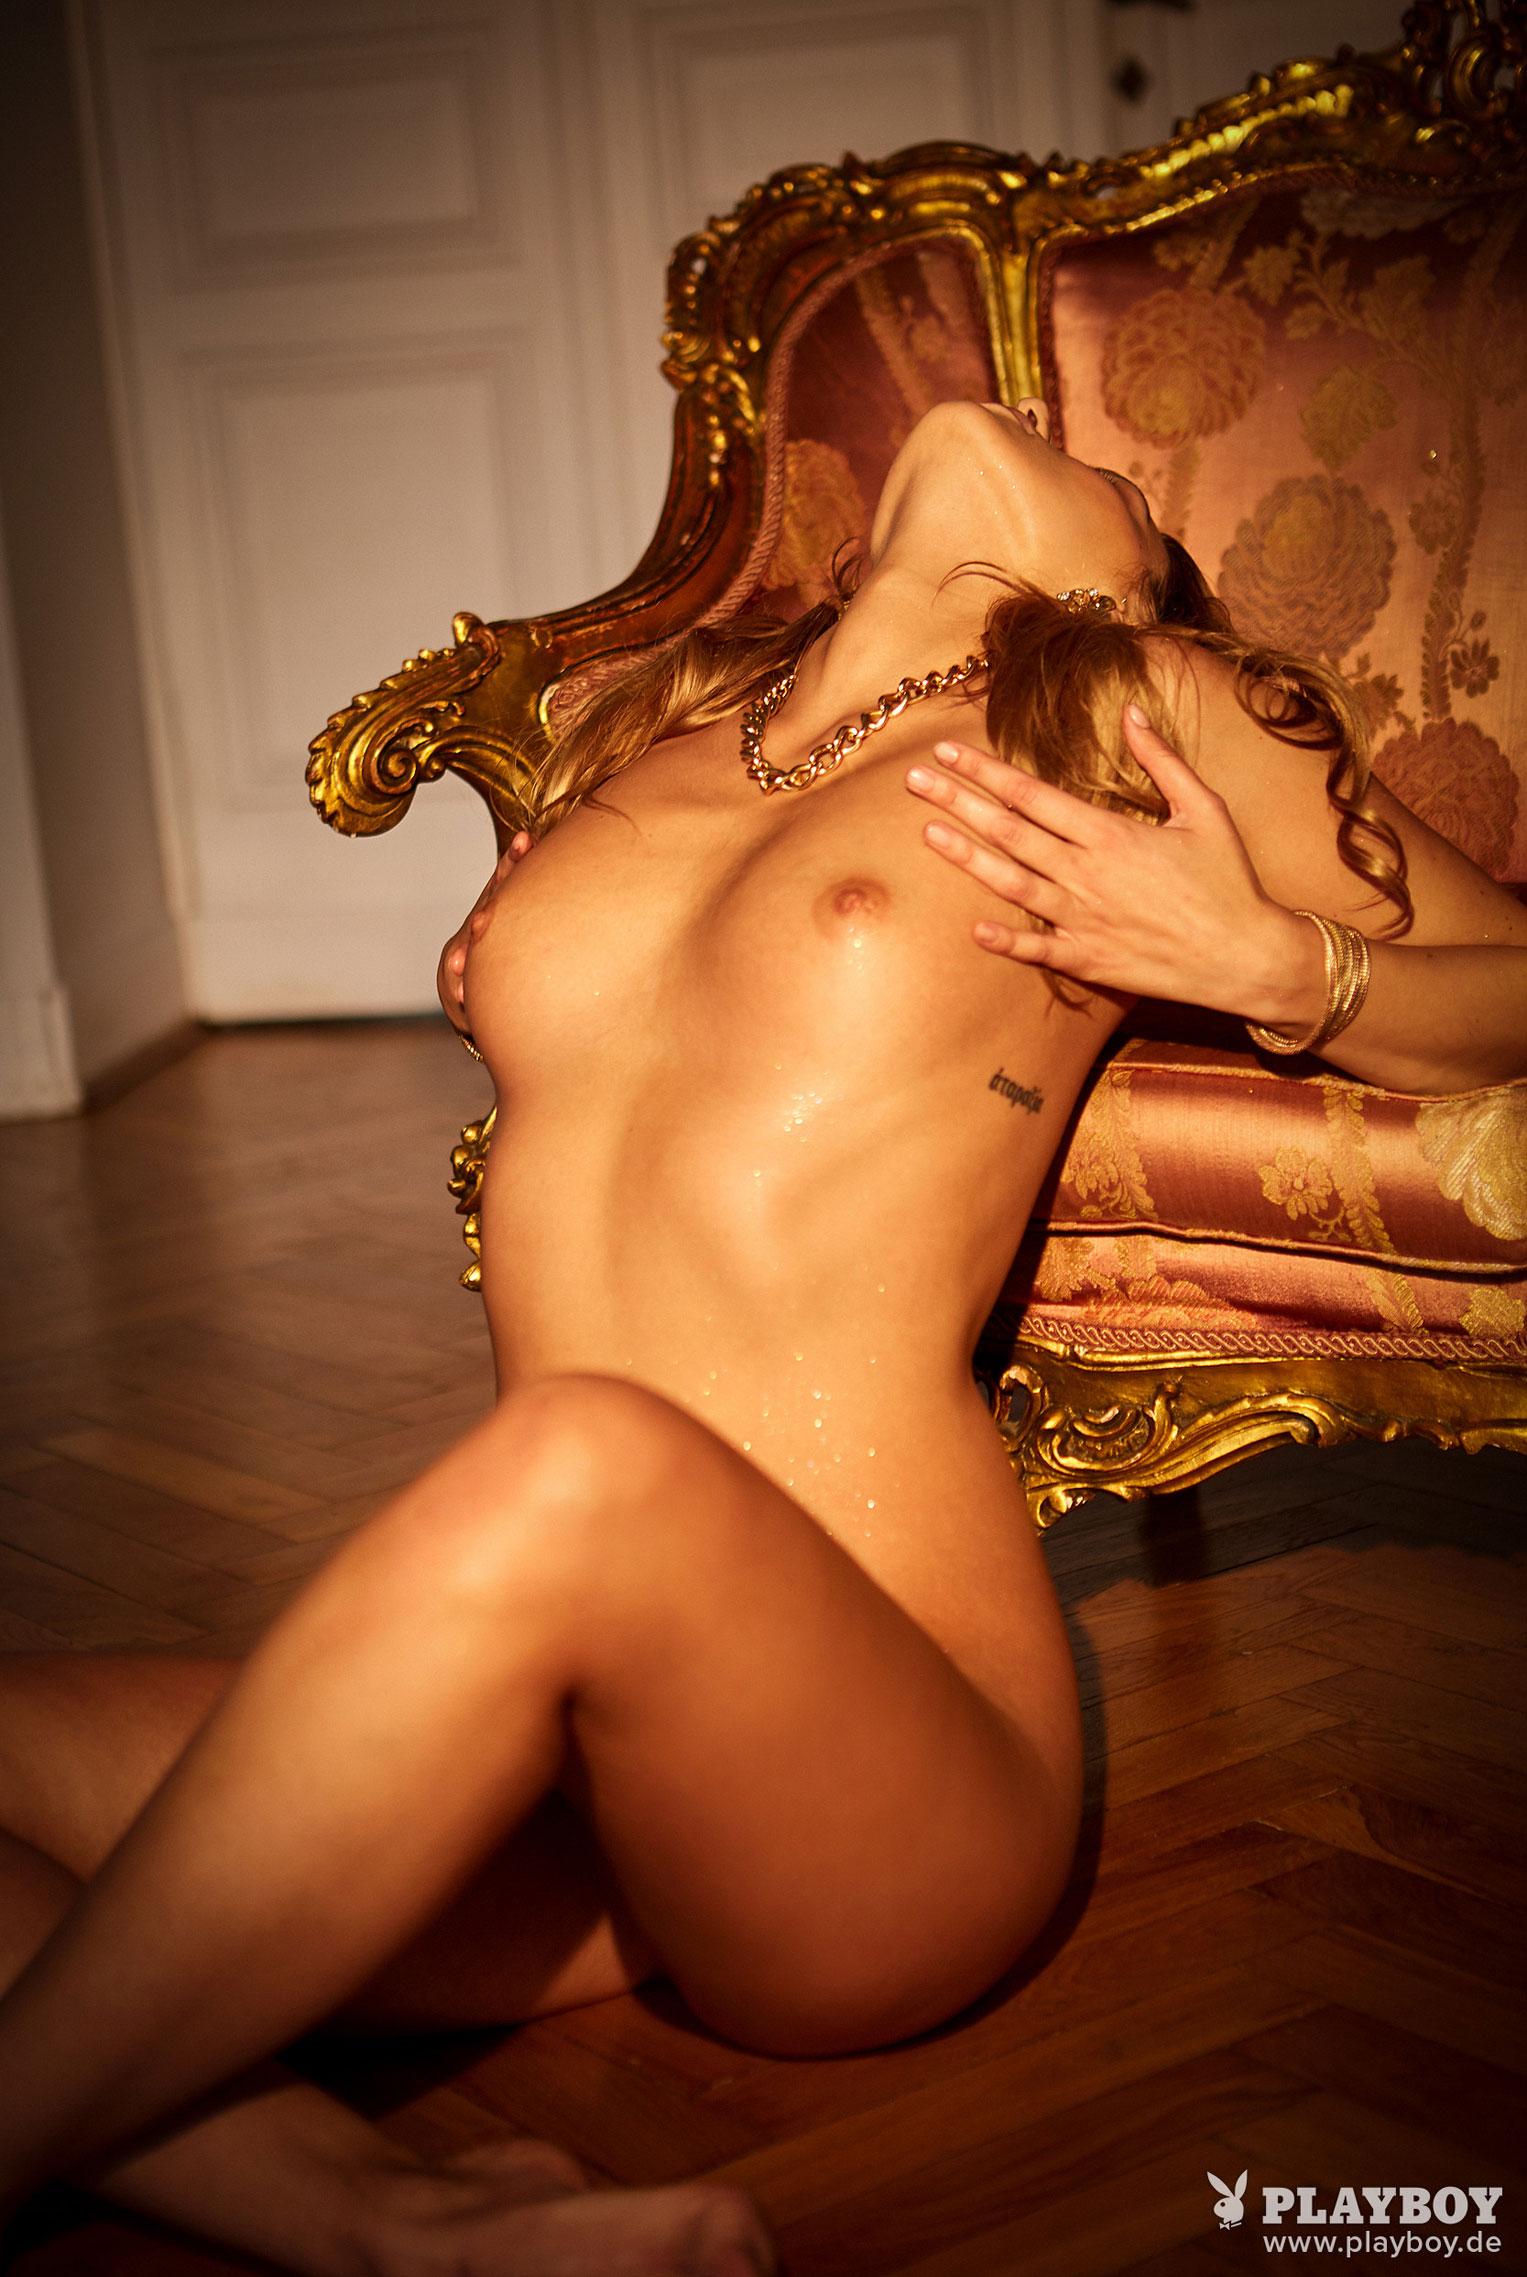 Девушка месяца Playboy Германия декабрь 2019 - Лена Беднарска / фото 04